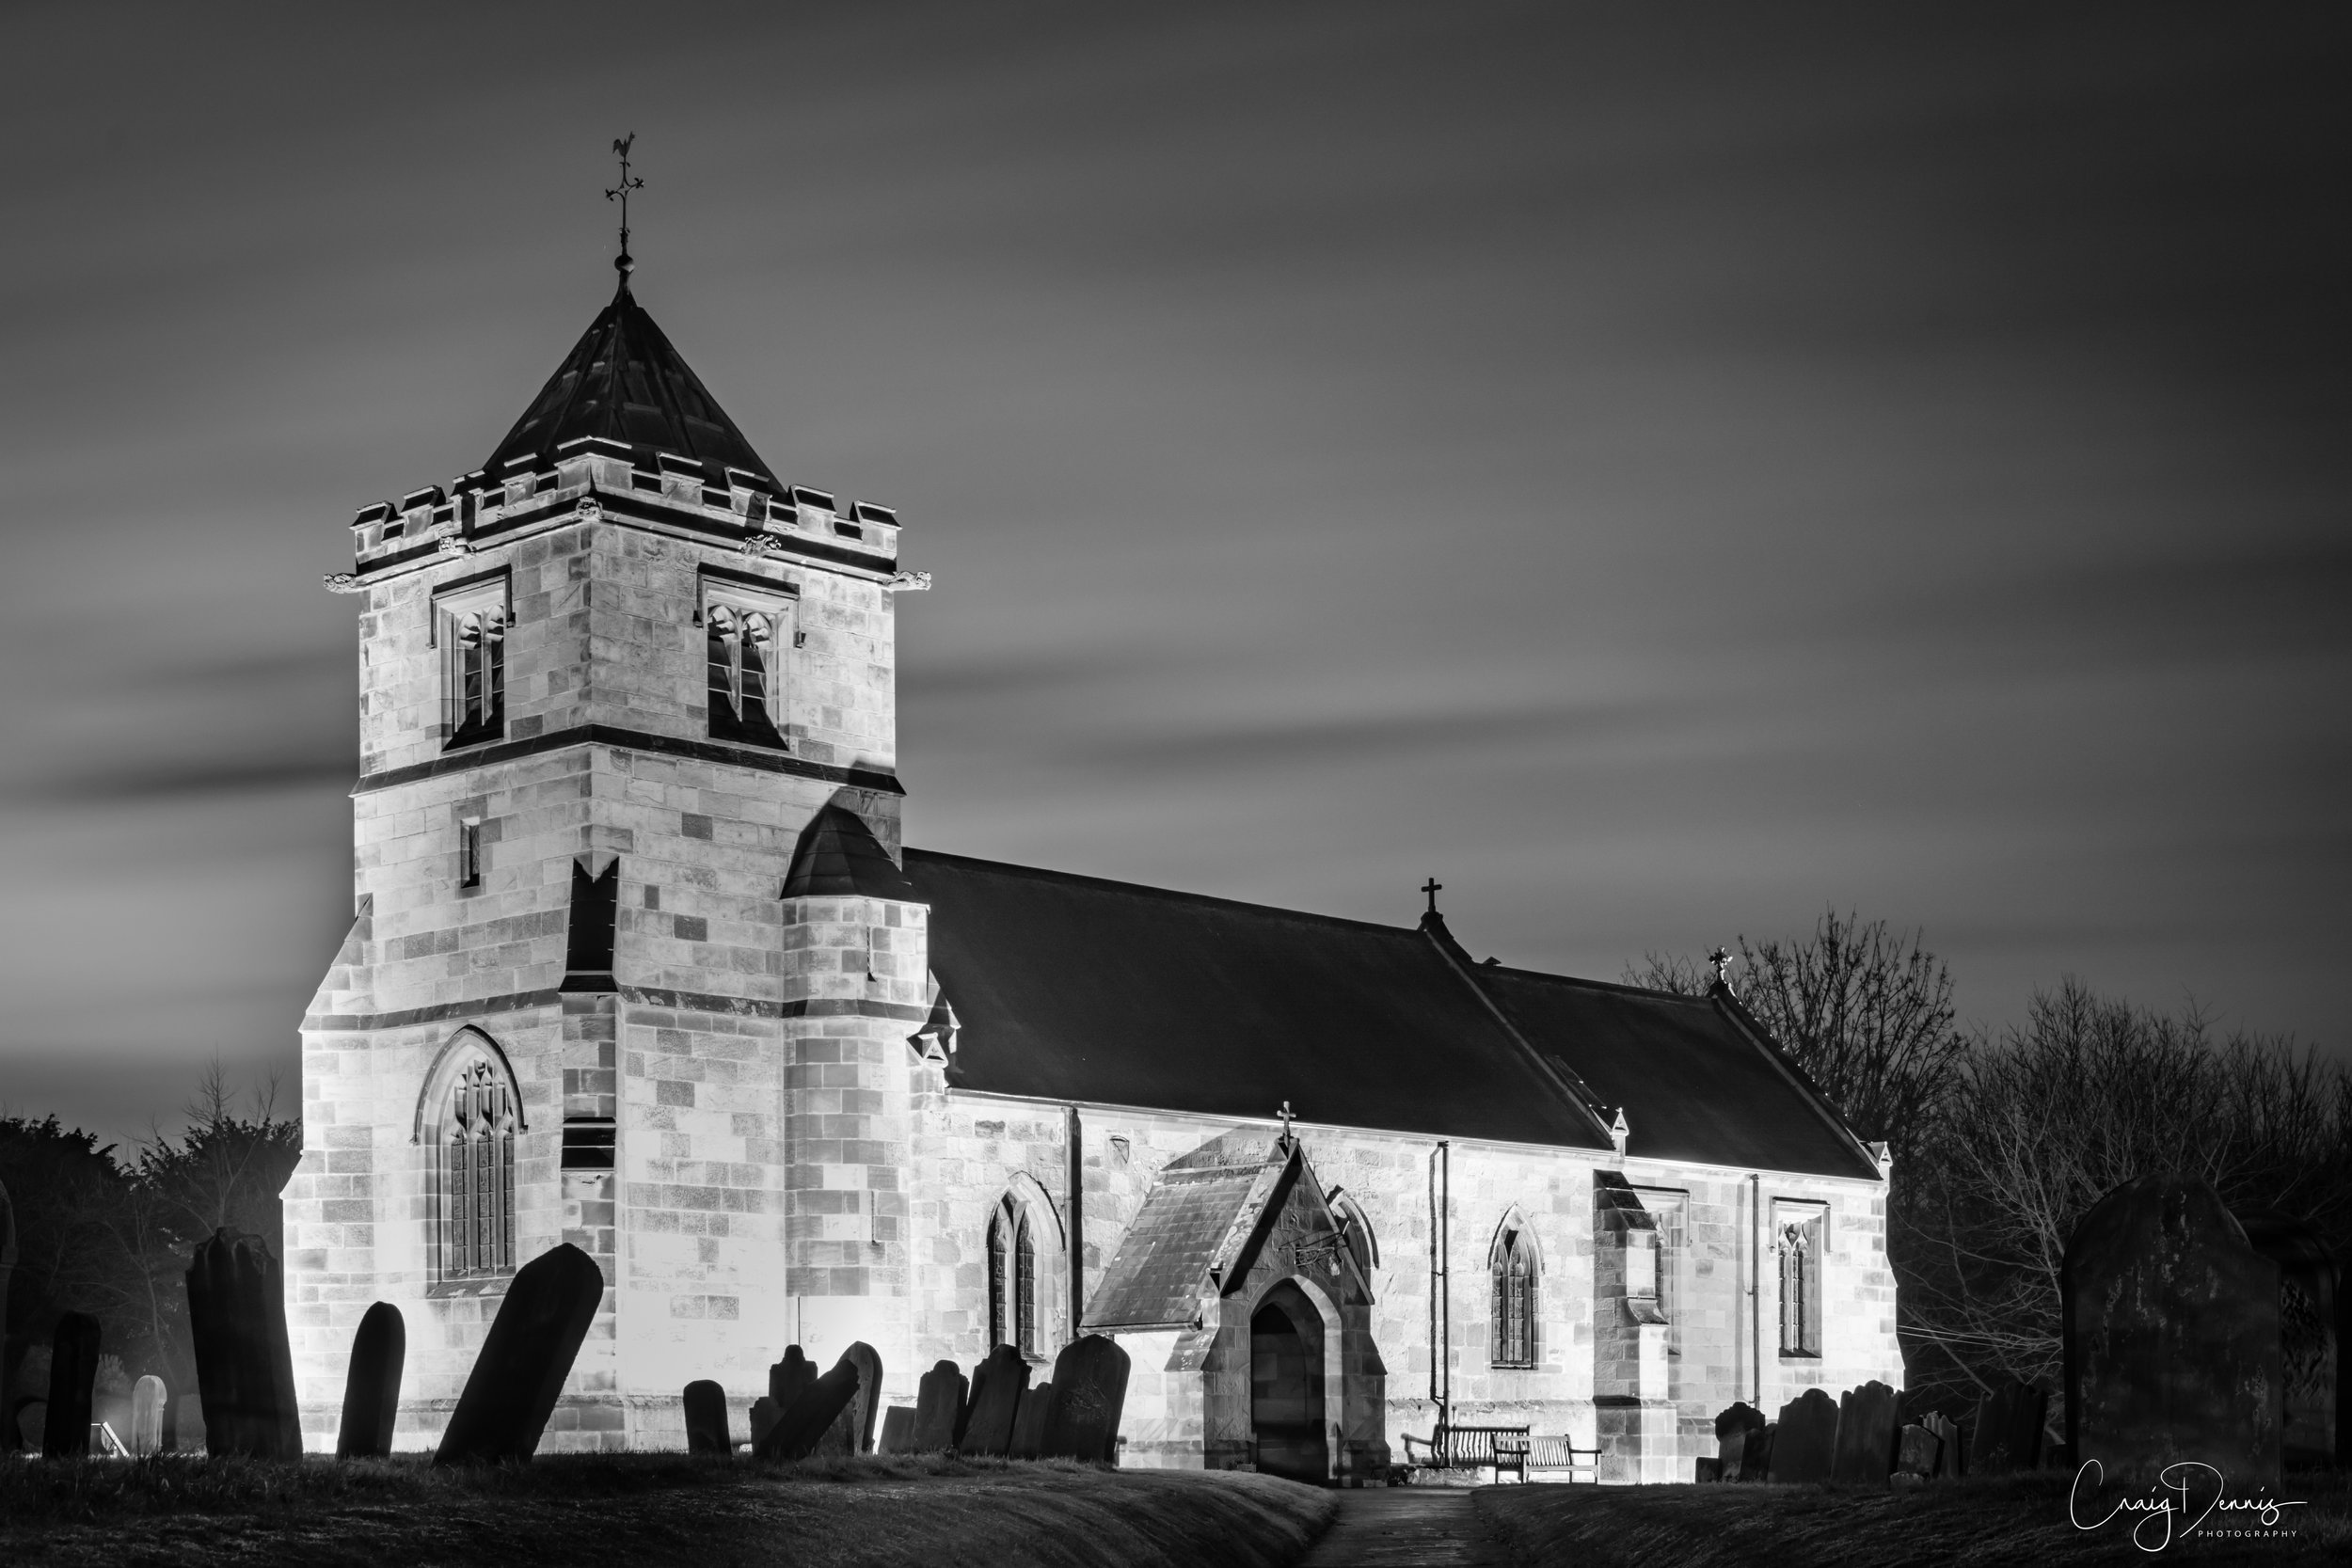 All Saints Church - Crathorne N-Yorks